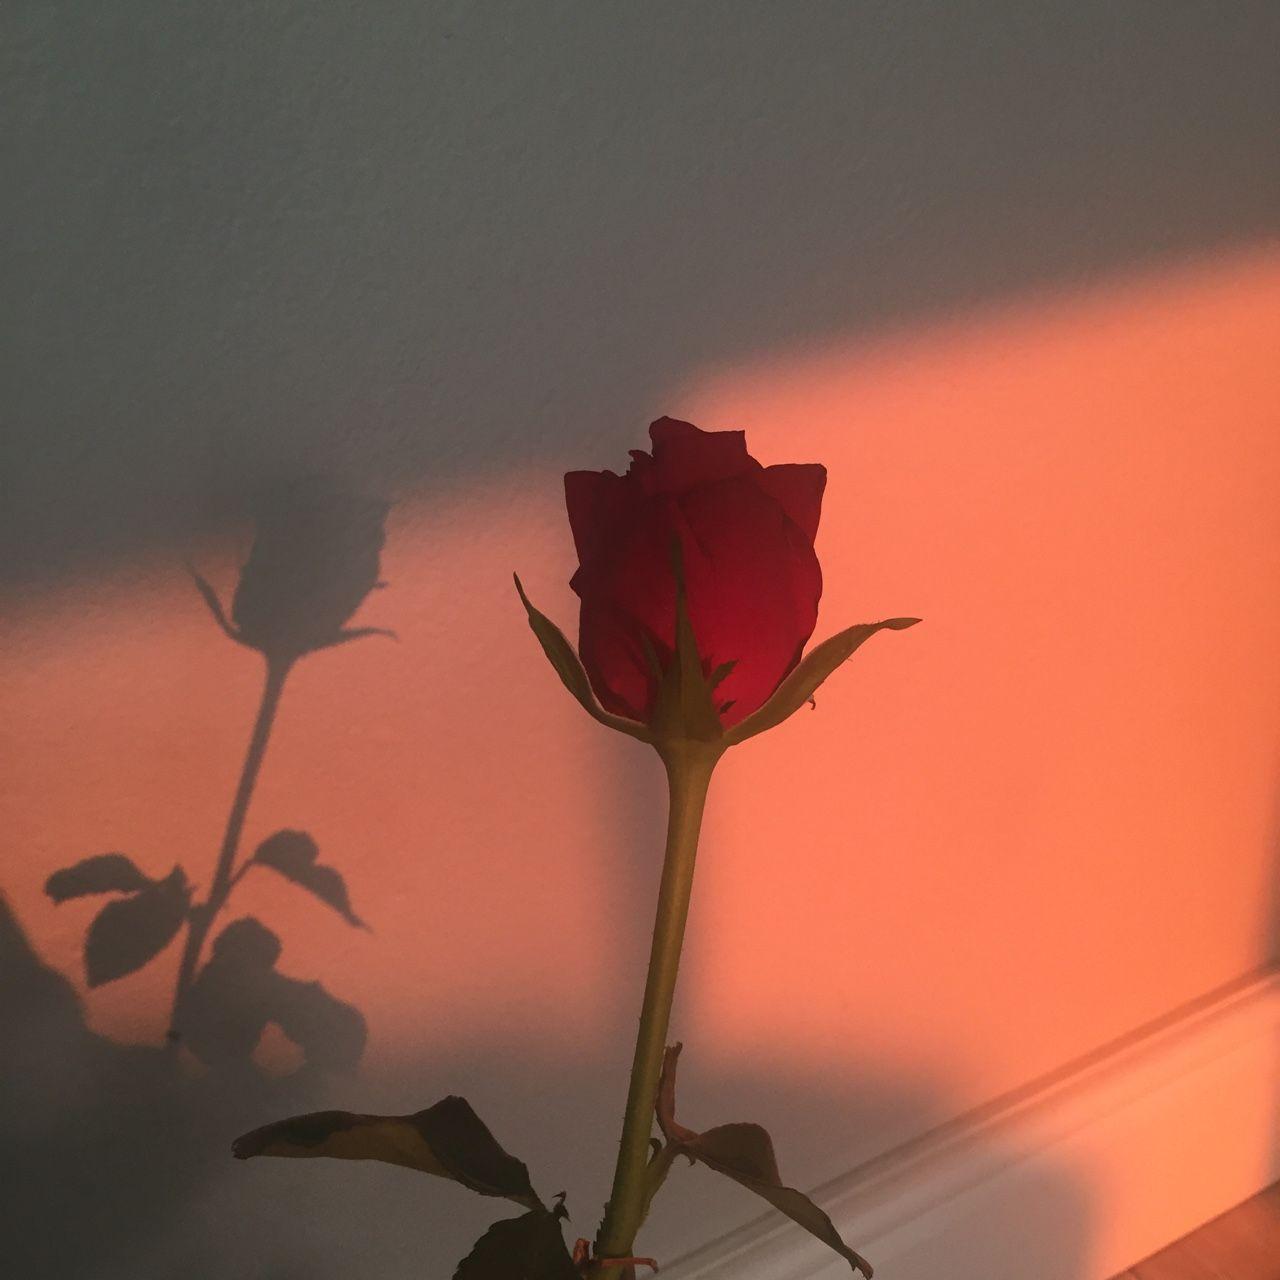 Pin By Emilee Mari On Blossom Aesthetic Roses Flower Aesthetic Red Aesthetic